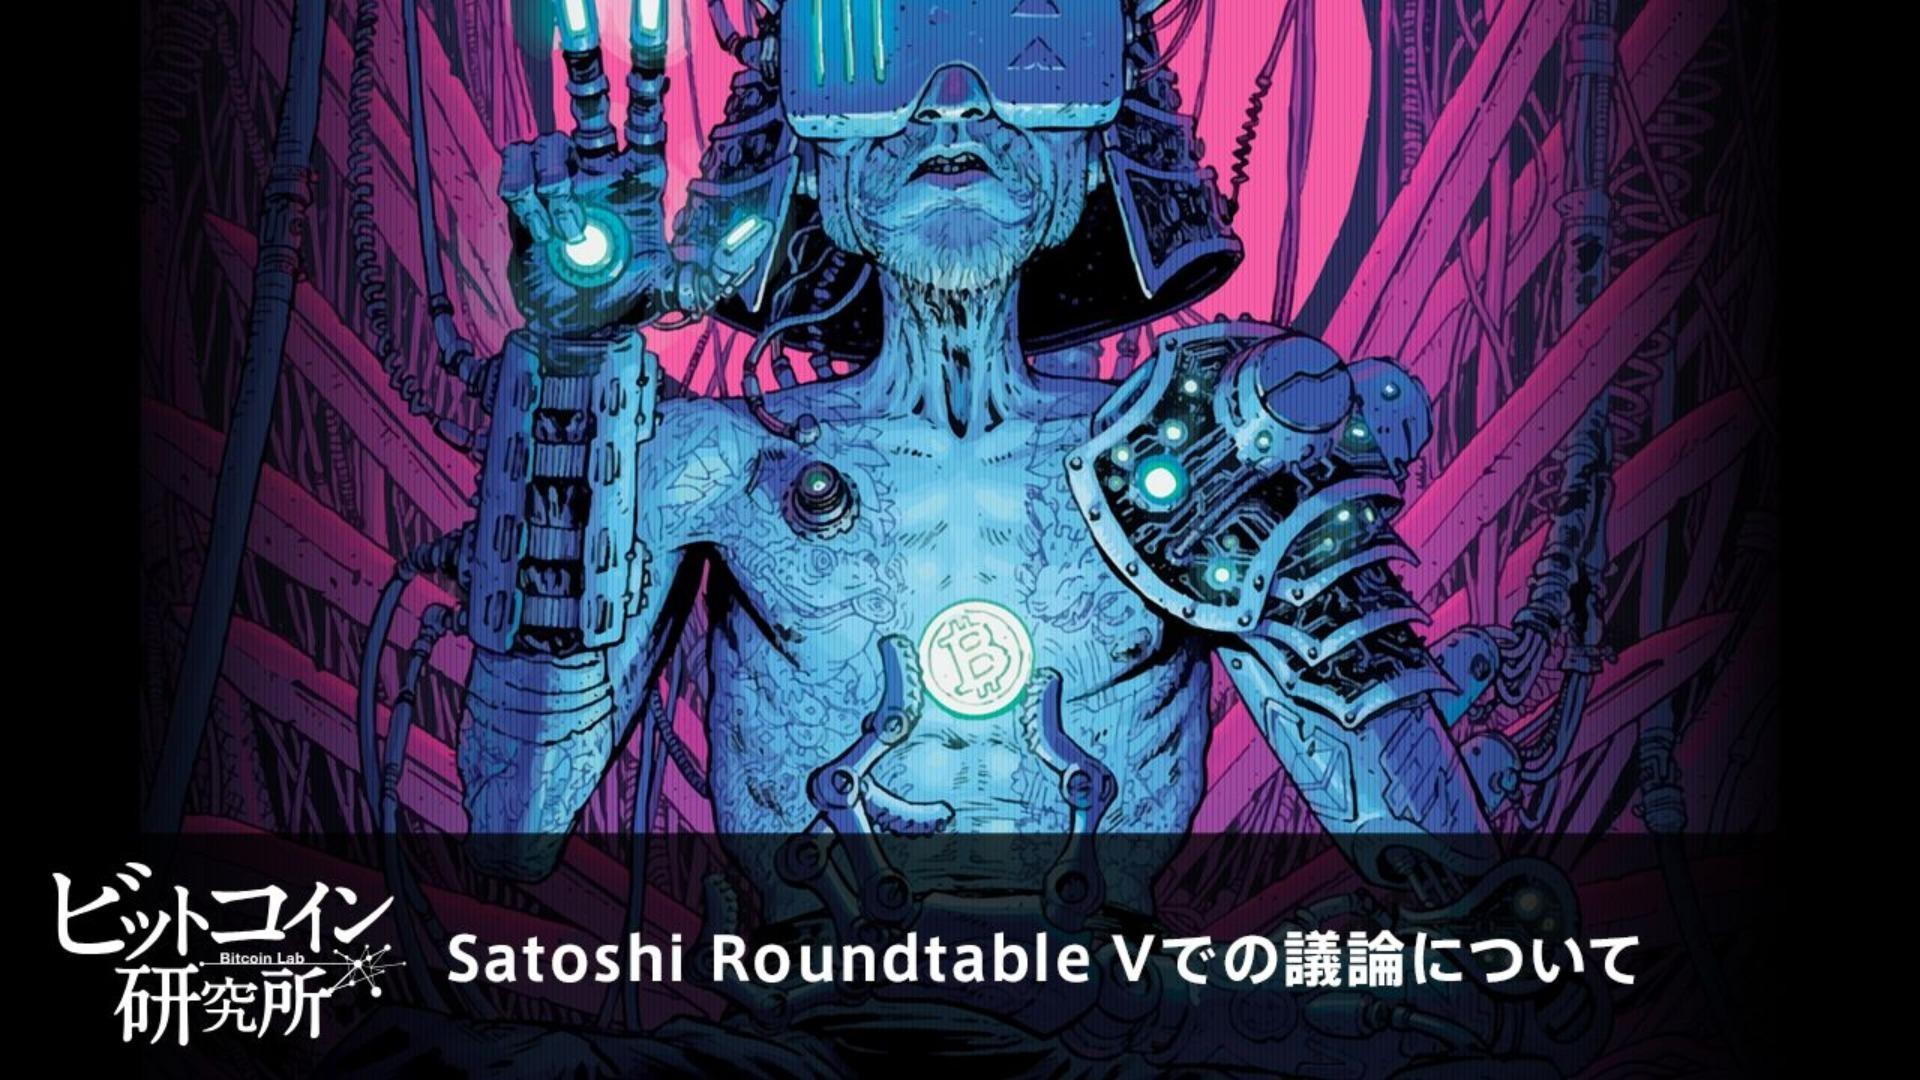 Satoshi Roundtable Vでの議論について